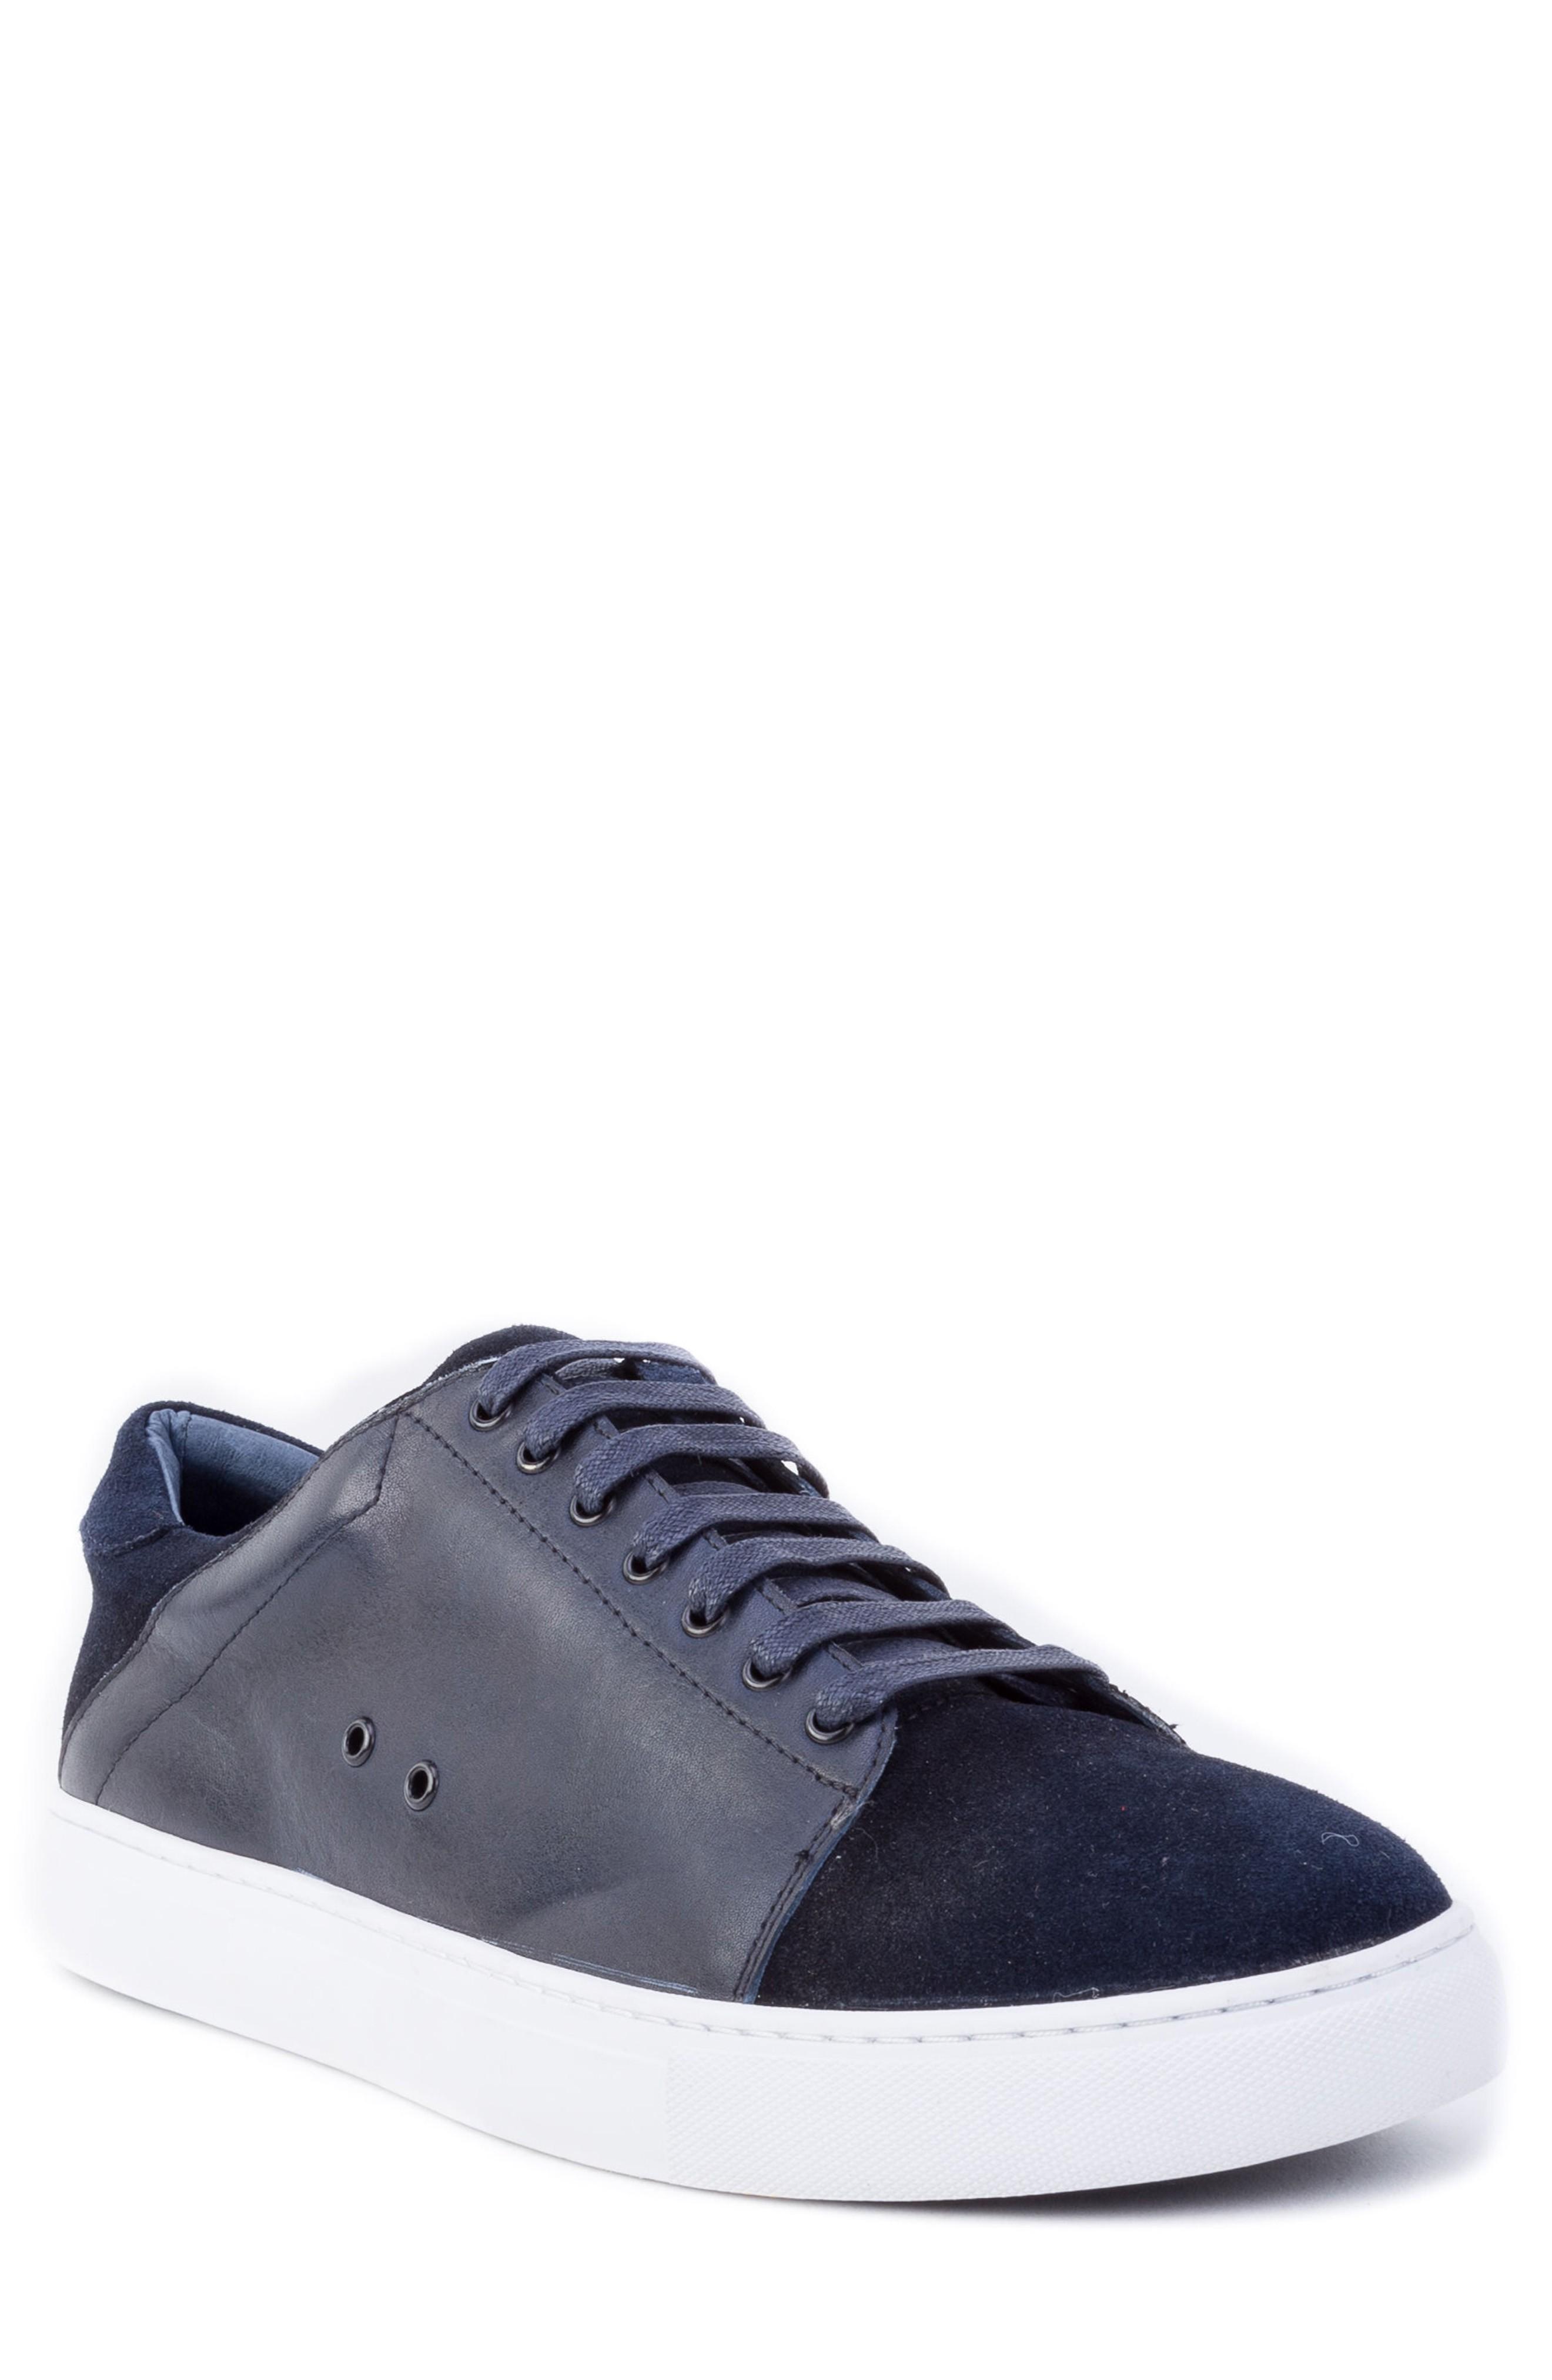 Zanzara Record Low Top Sneaker In Navy Suede/ Leather